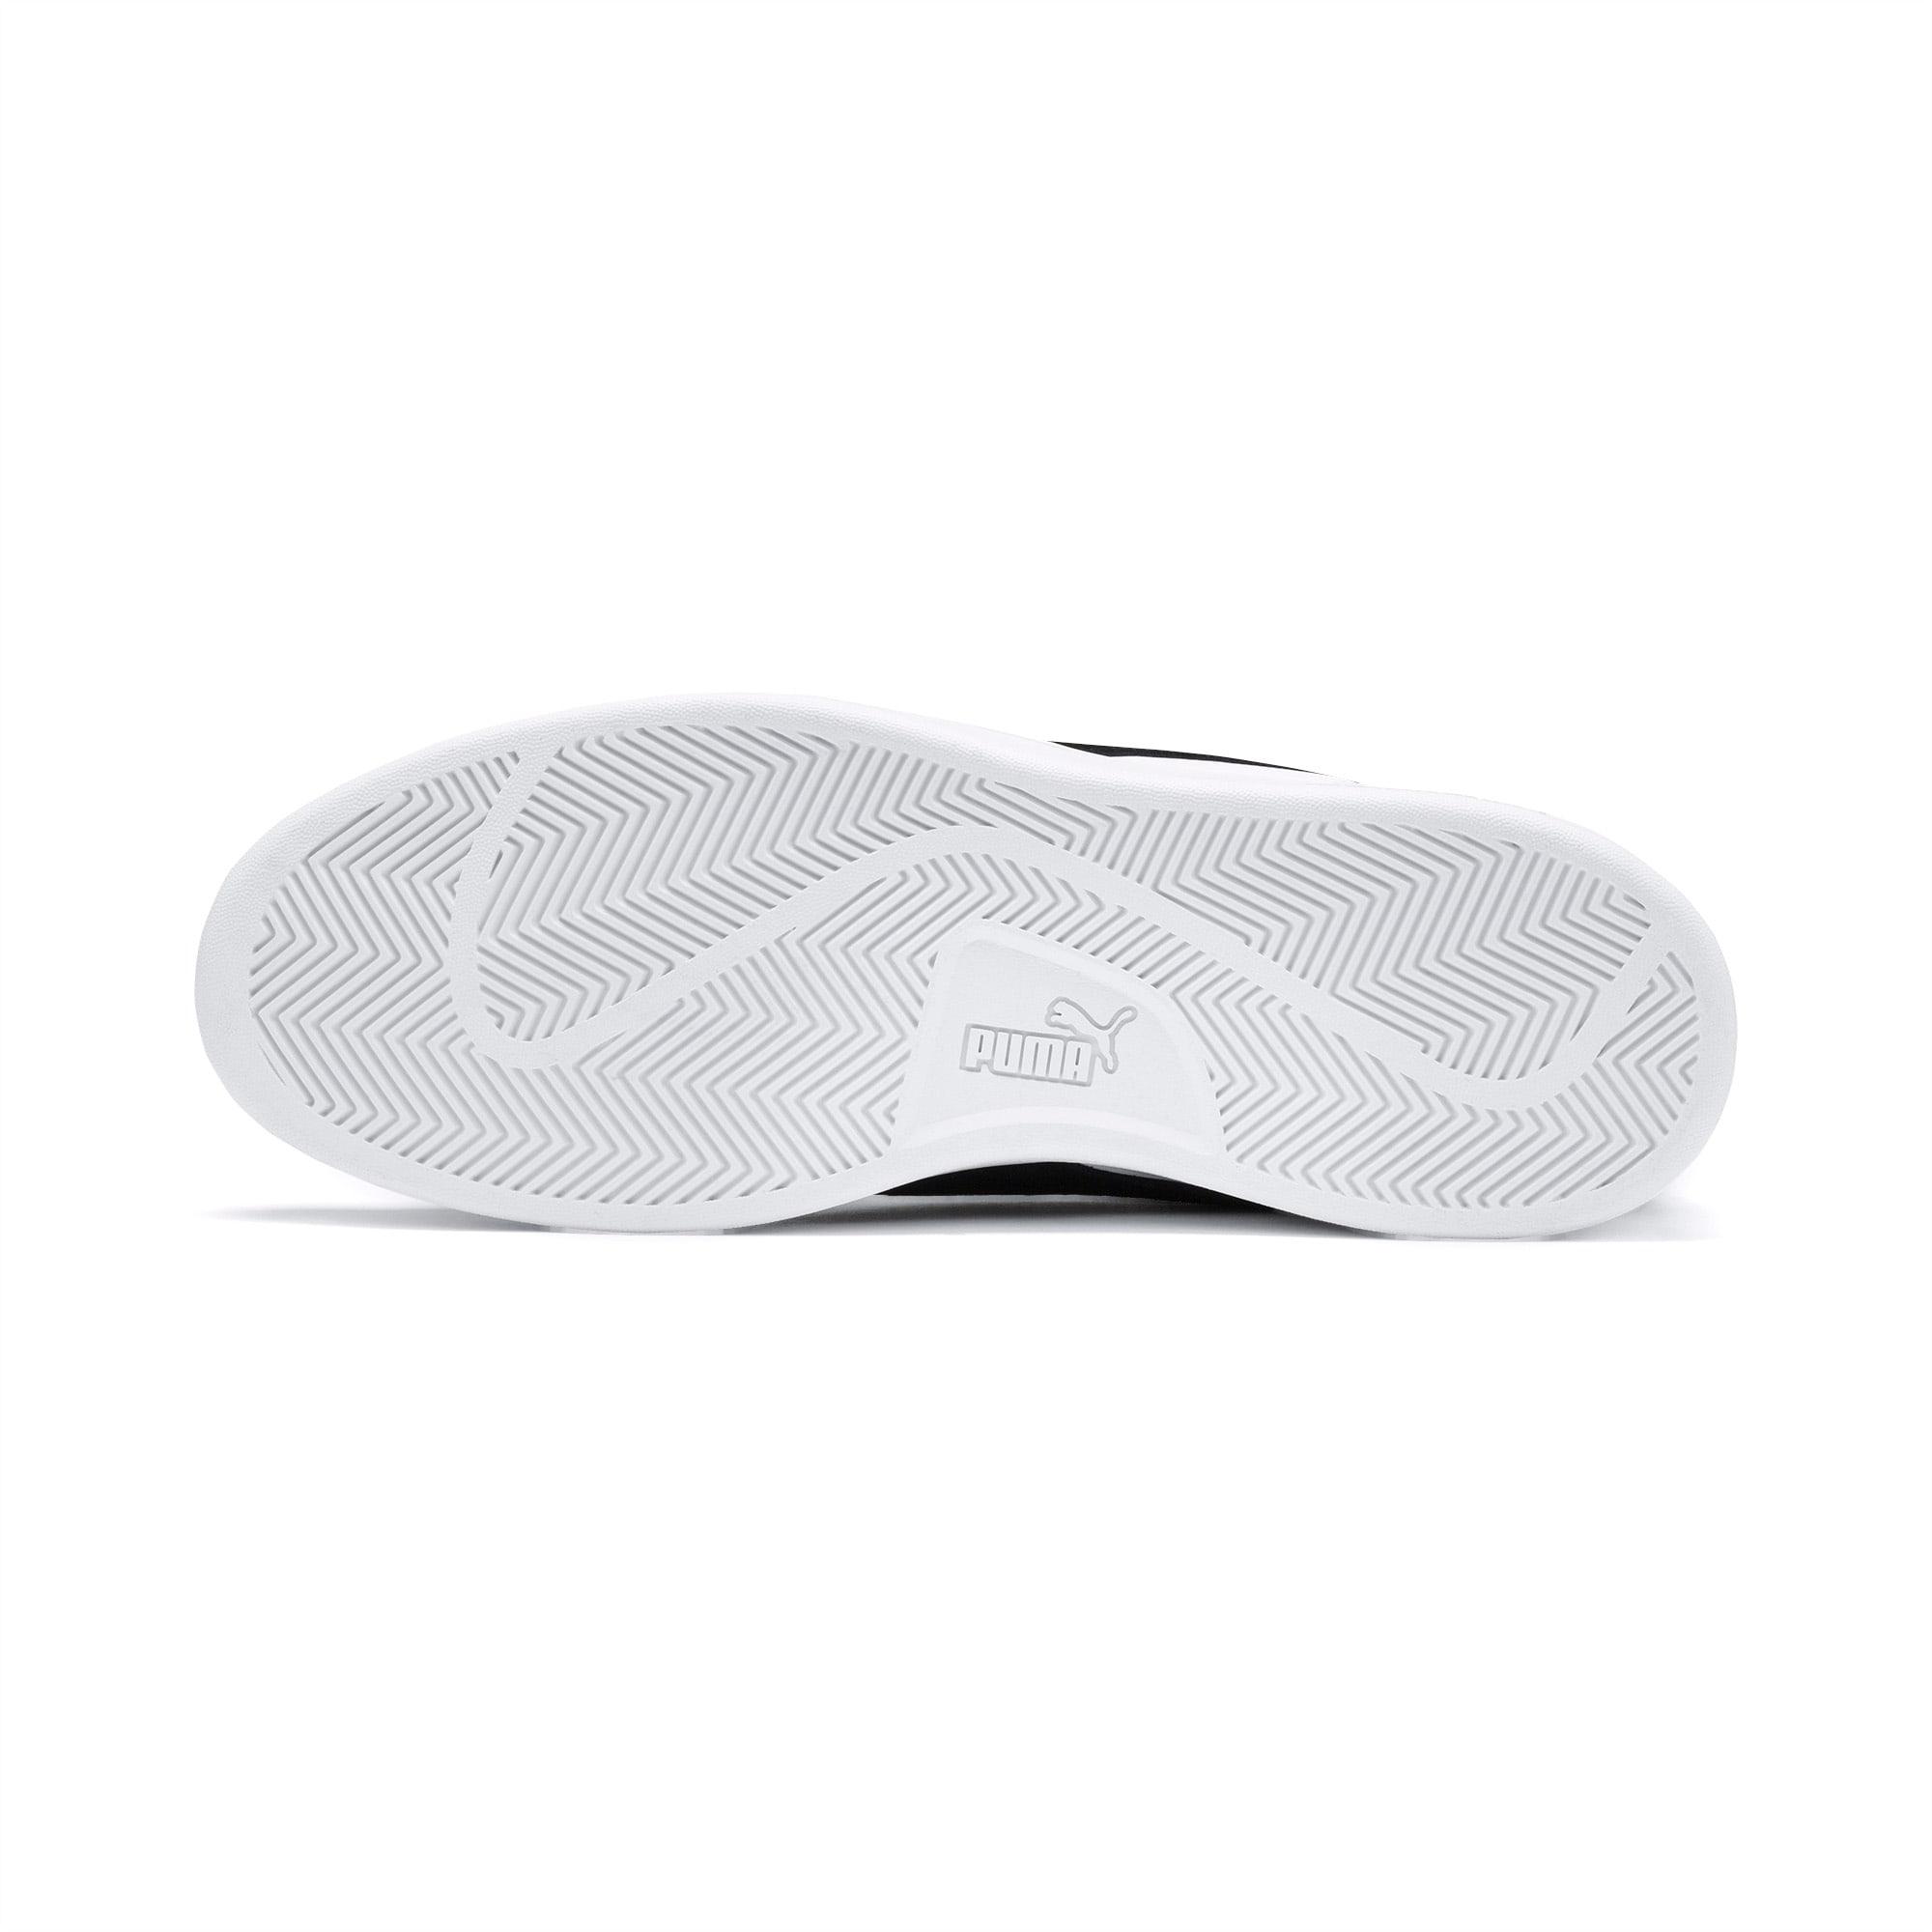 Smash v2 Mid Cut Sneaker | White Black Gold High Rise | PUMA